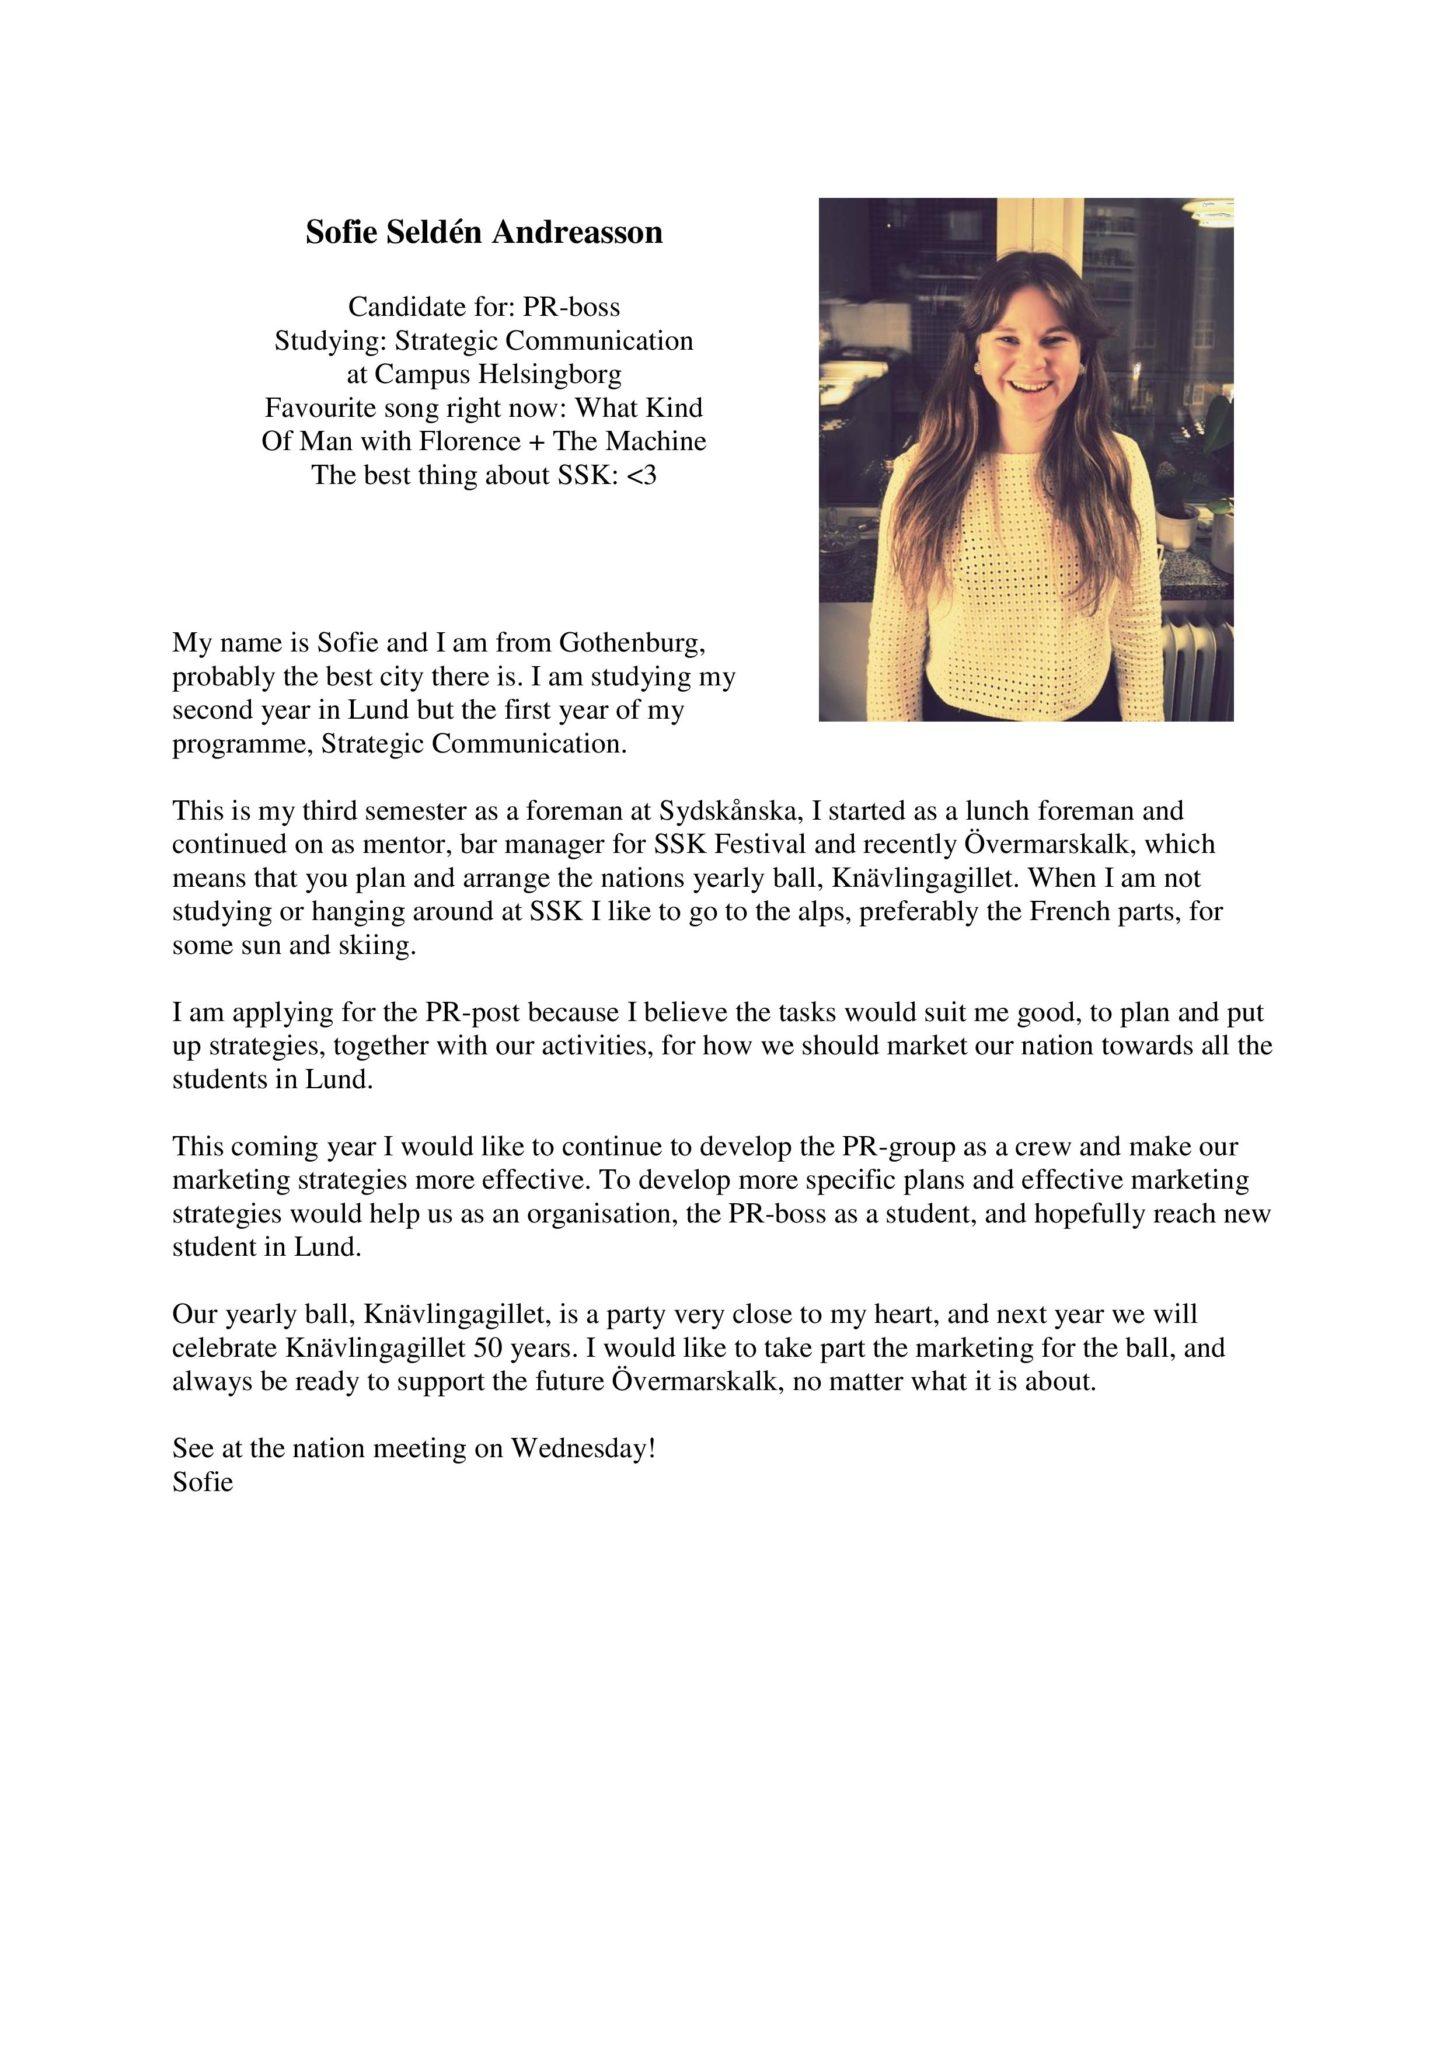 Sofie Seldén Pr-kandidatur engelska-page-001